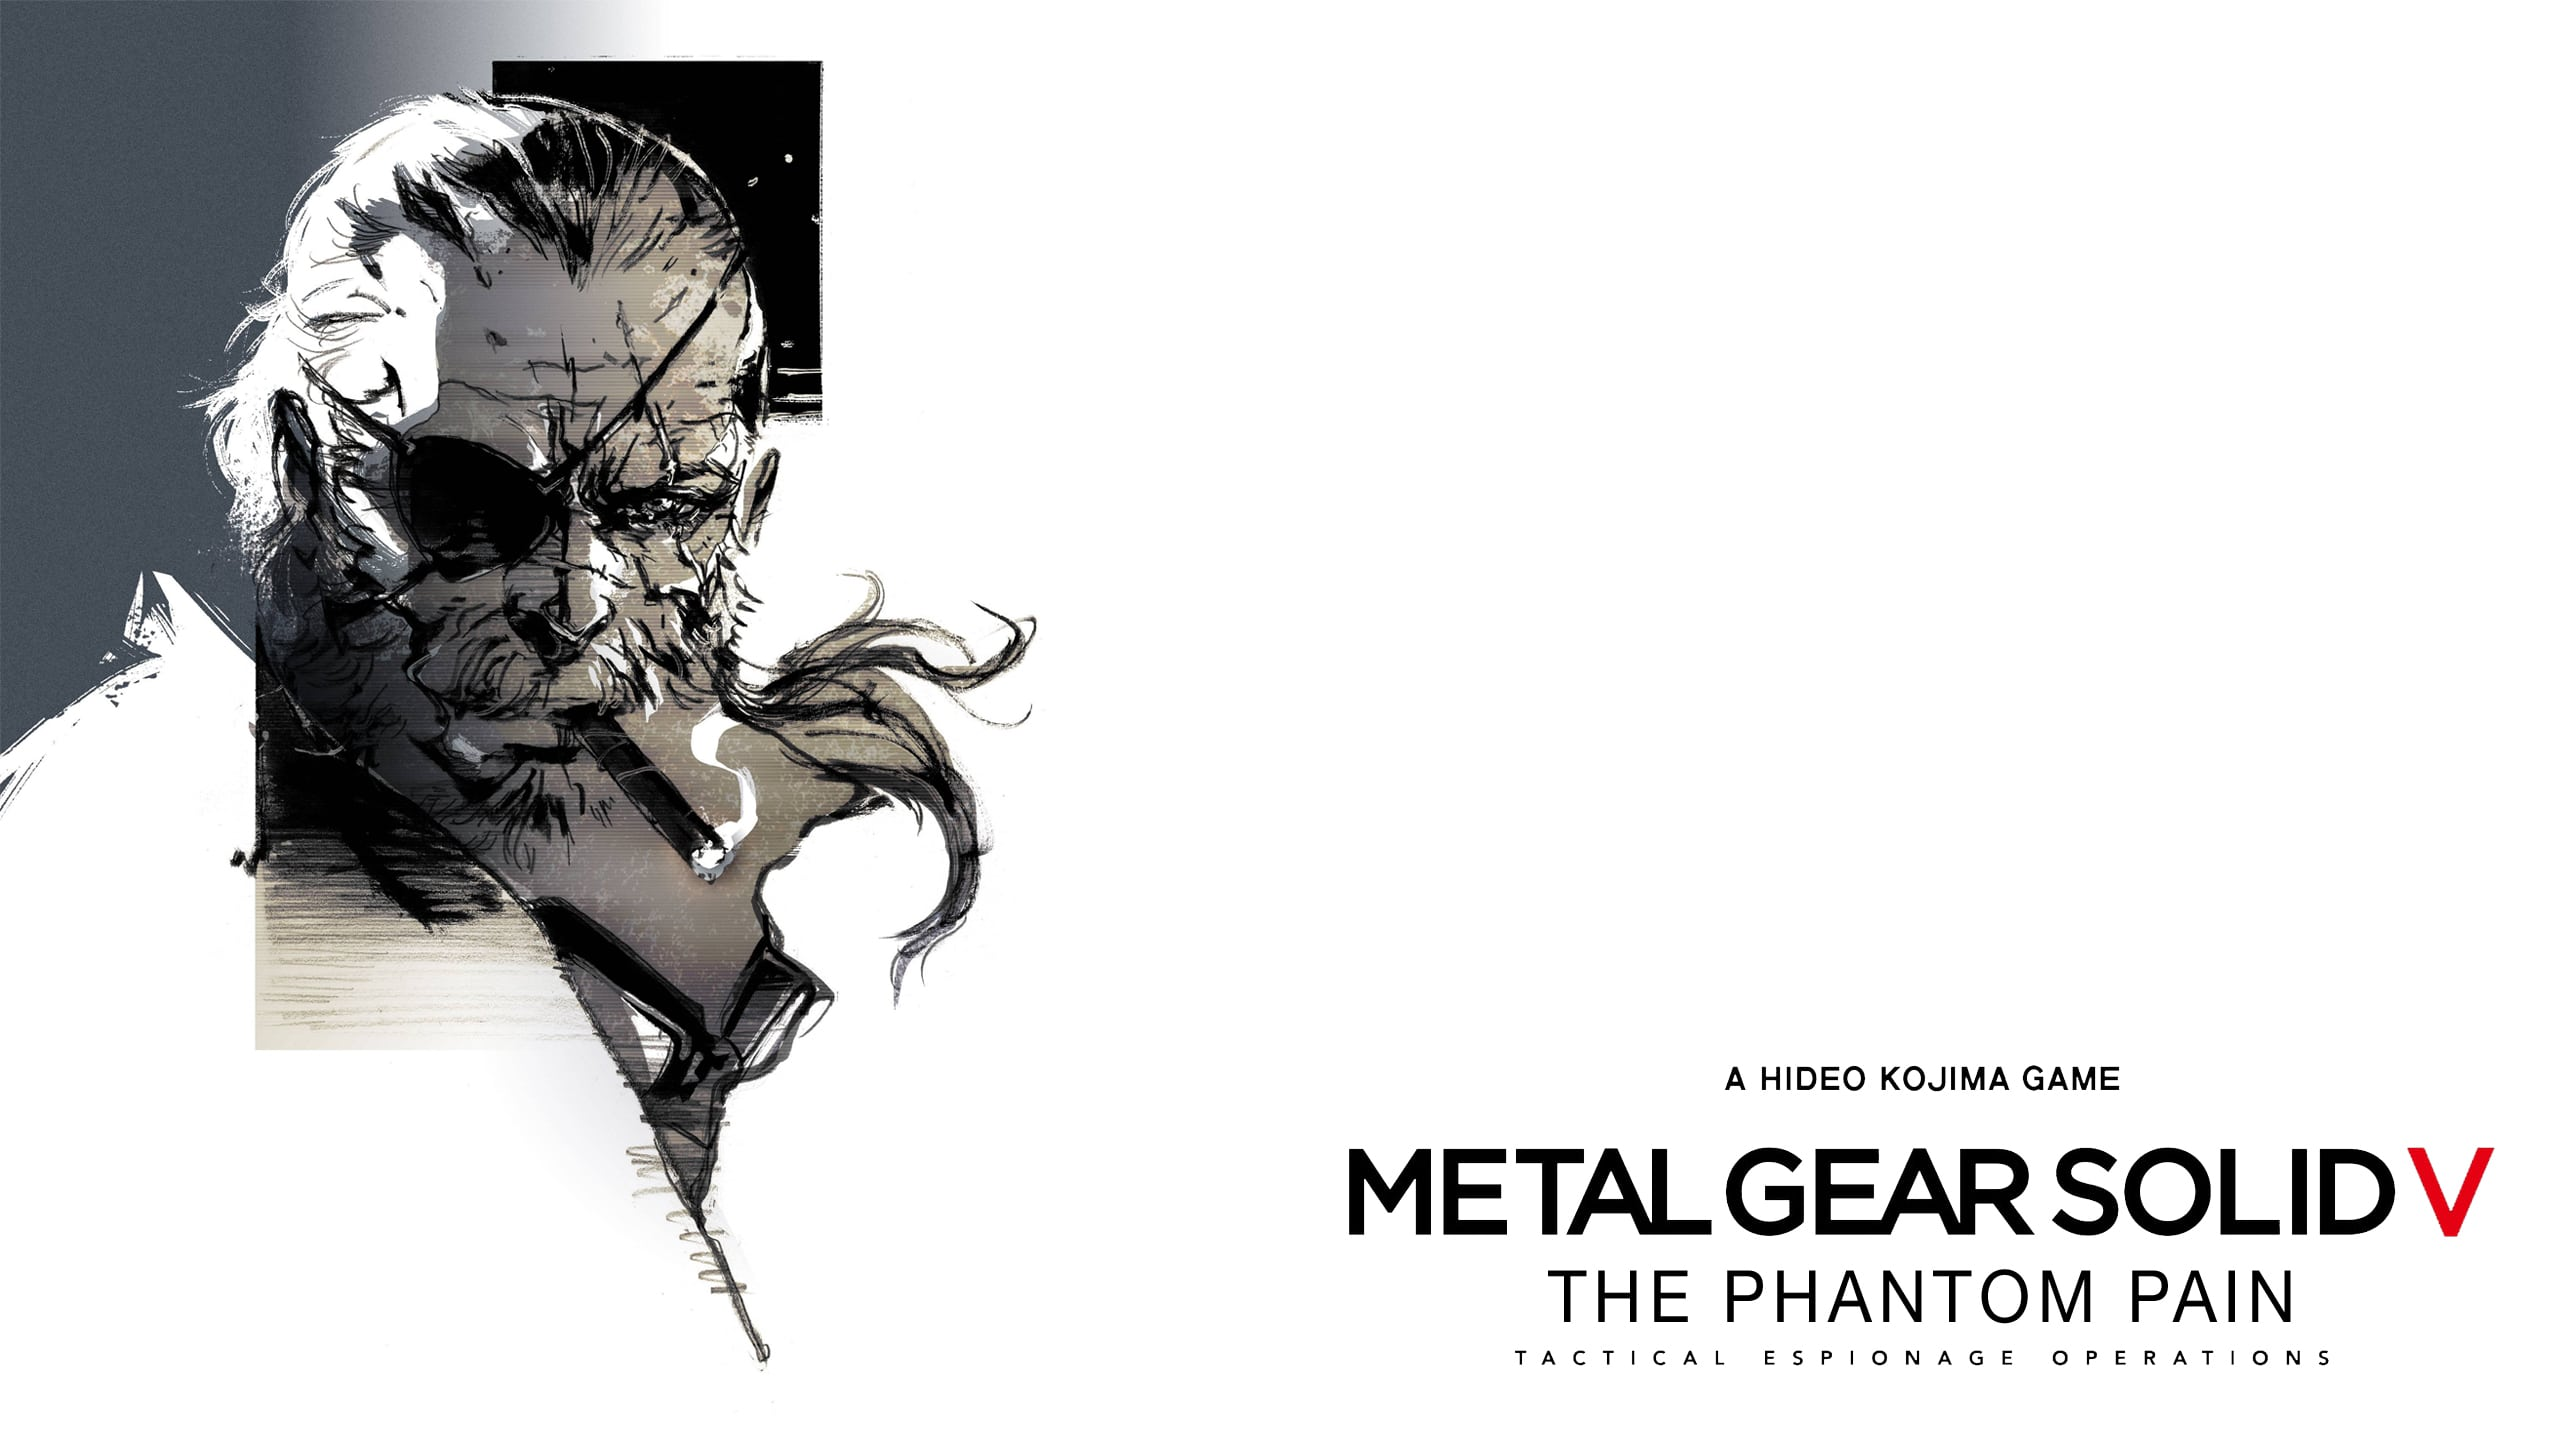 Metal Gear Solid V: The Phantom Pain Desktop wallpapers